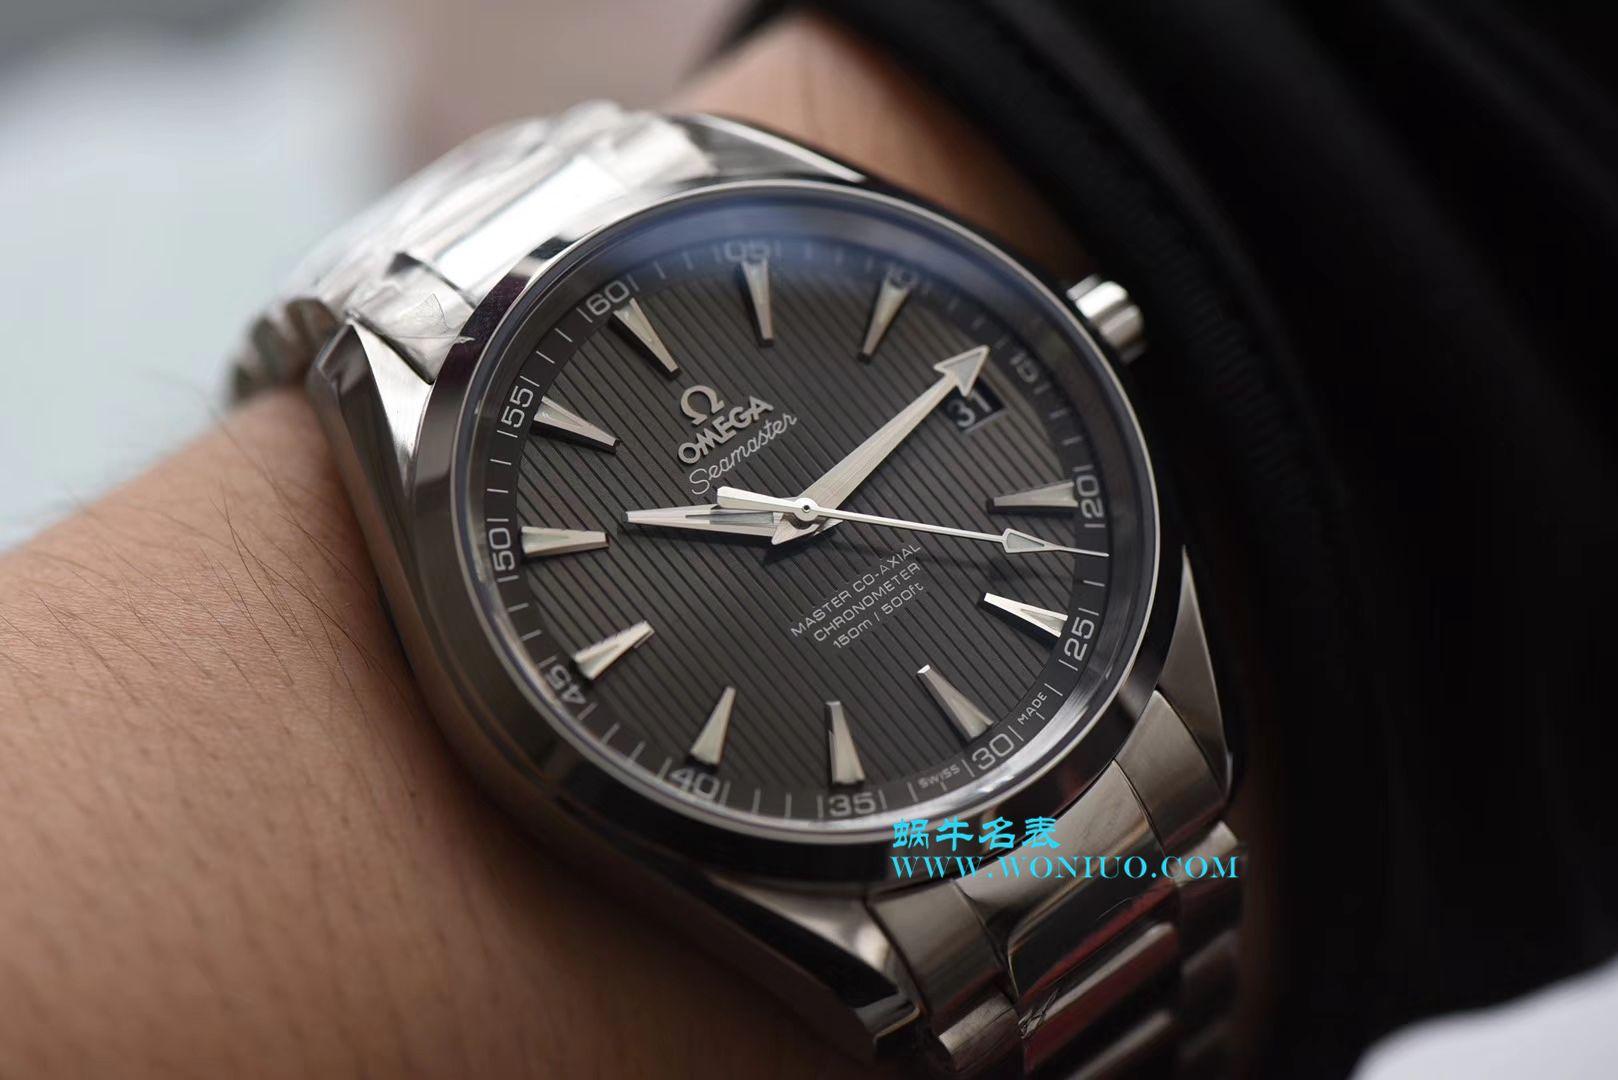 【VS一比一超A复刻手表】欧米茄海马系列231.10.42.21.01.003腕表